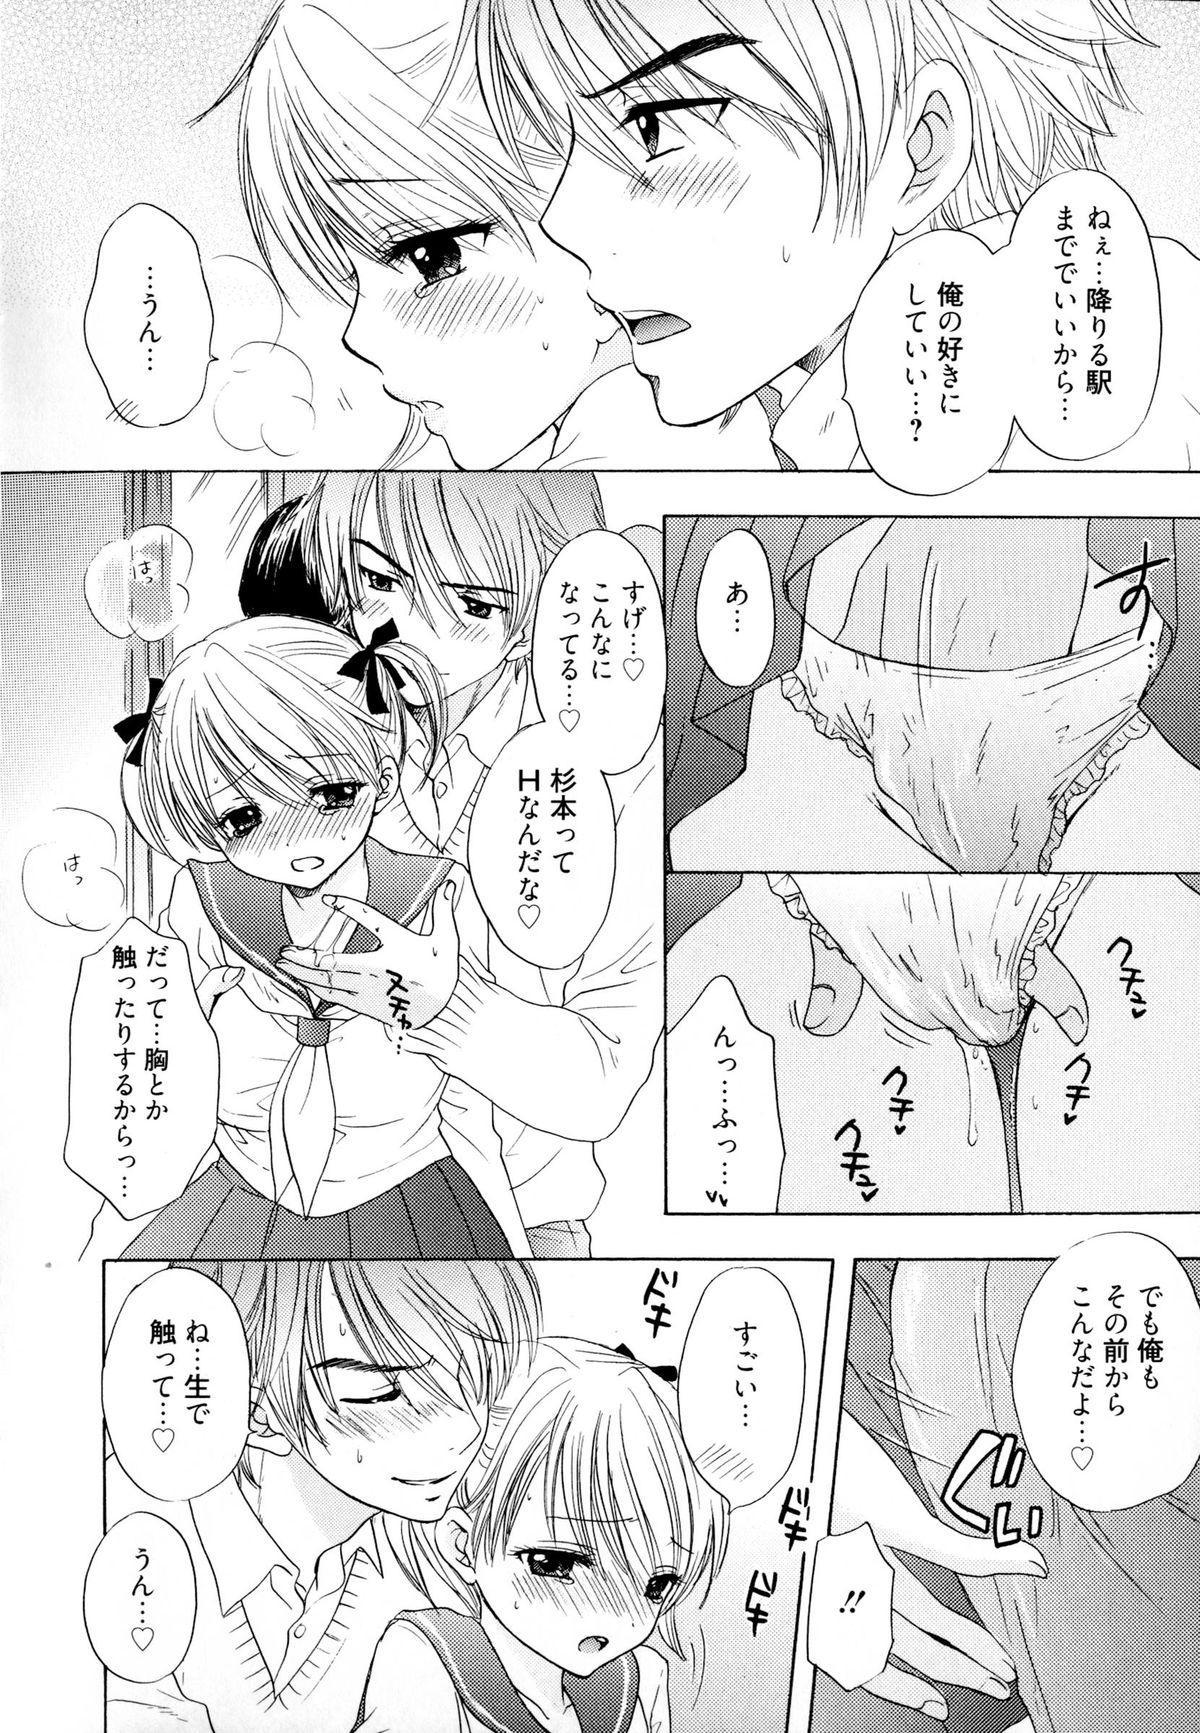 The Great Escape 4 Shokai Genteiban 65